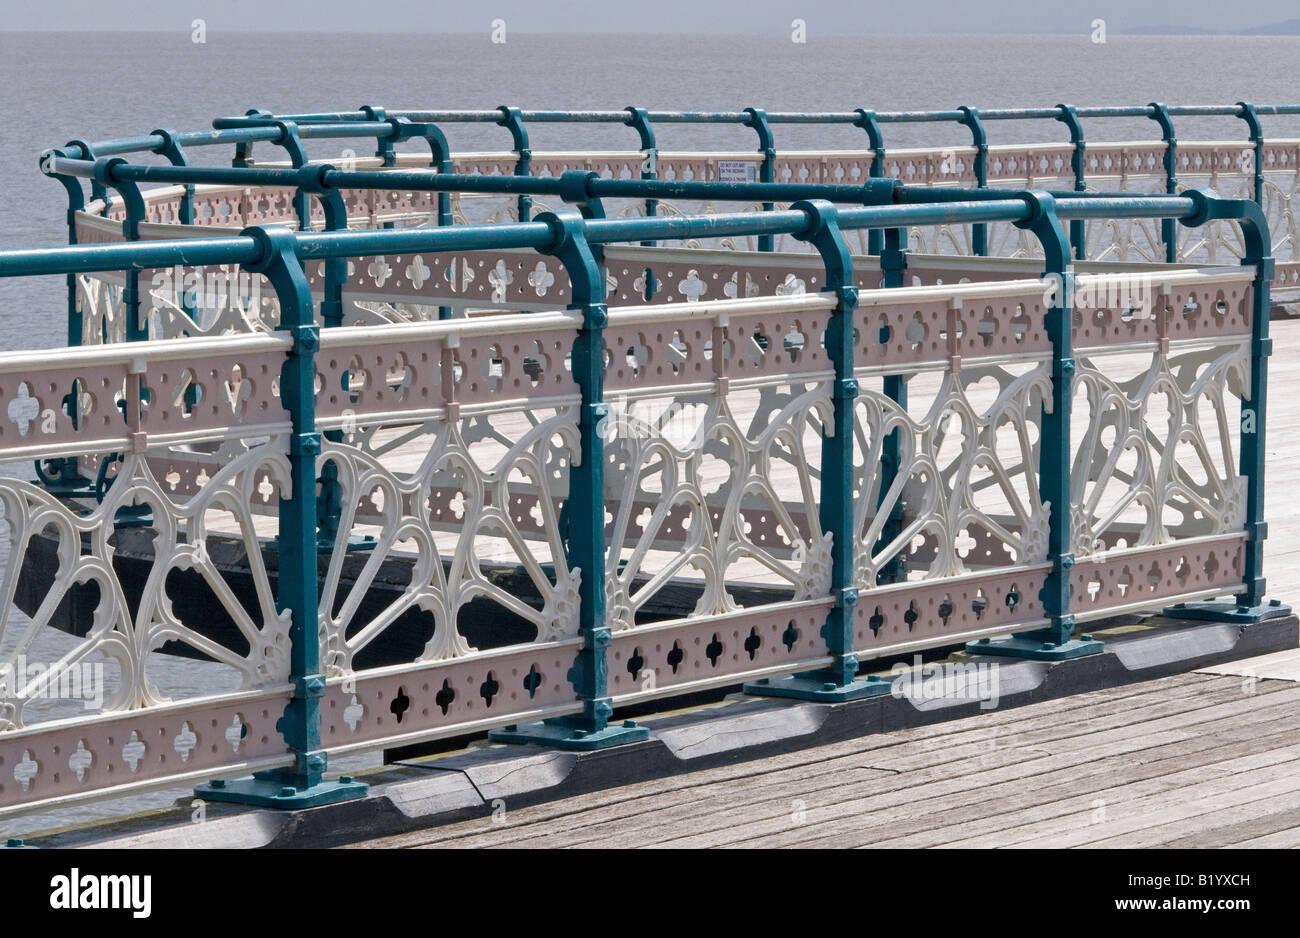 Cast Iron Railings on Penarth Pier South Wales - Stock Image